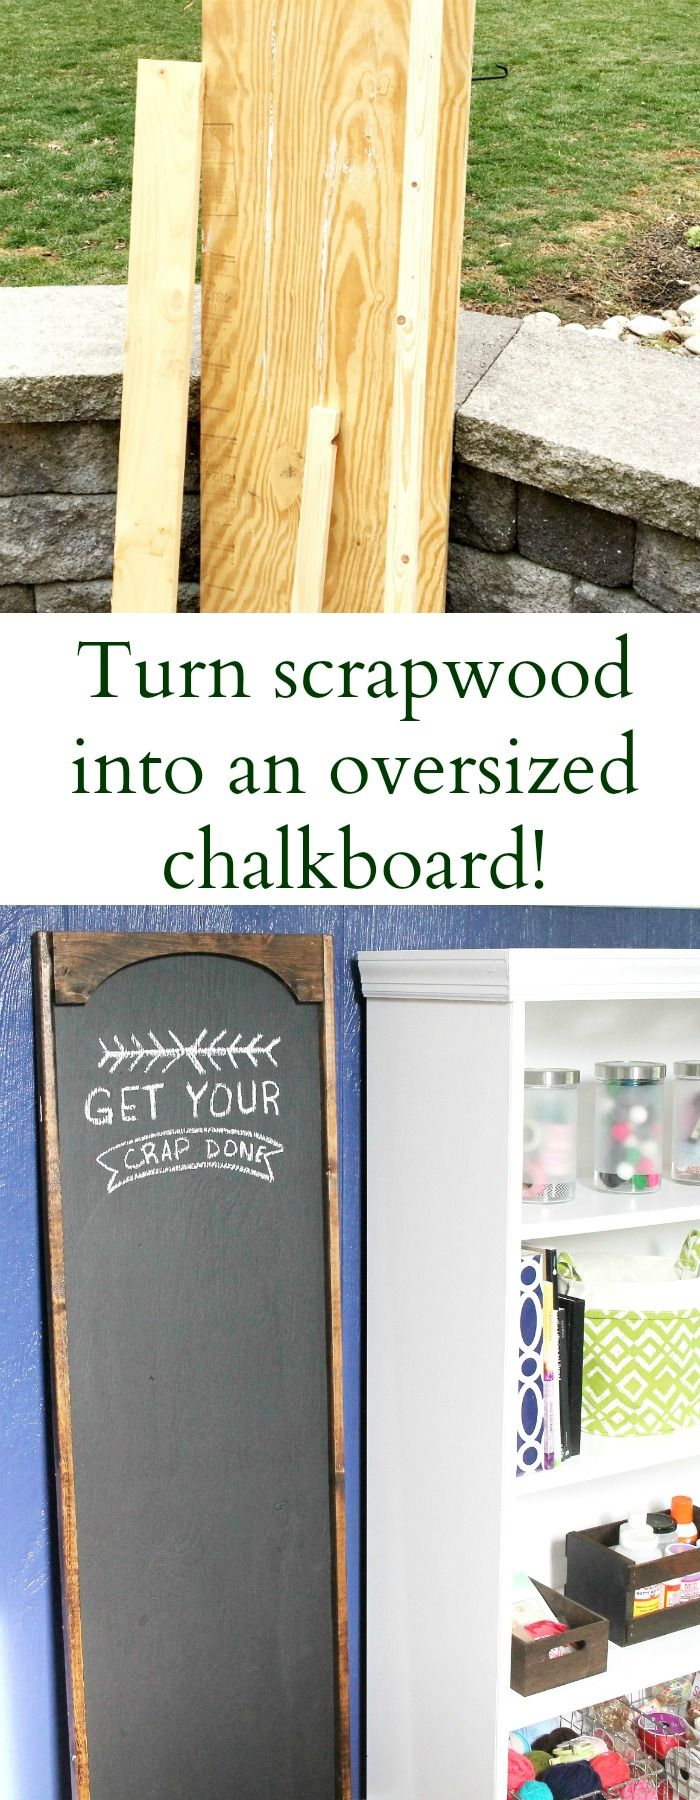 187 best Chalk It Up images on Pinterest | Chalk talk, Chalkboard ...